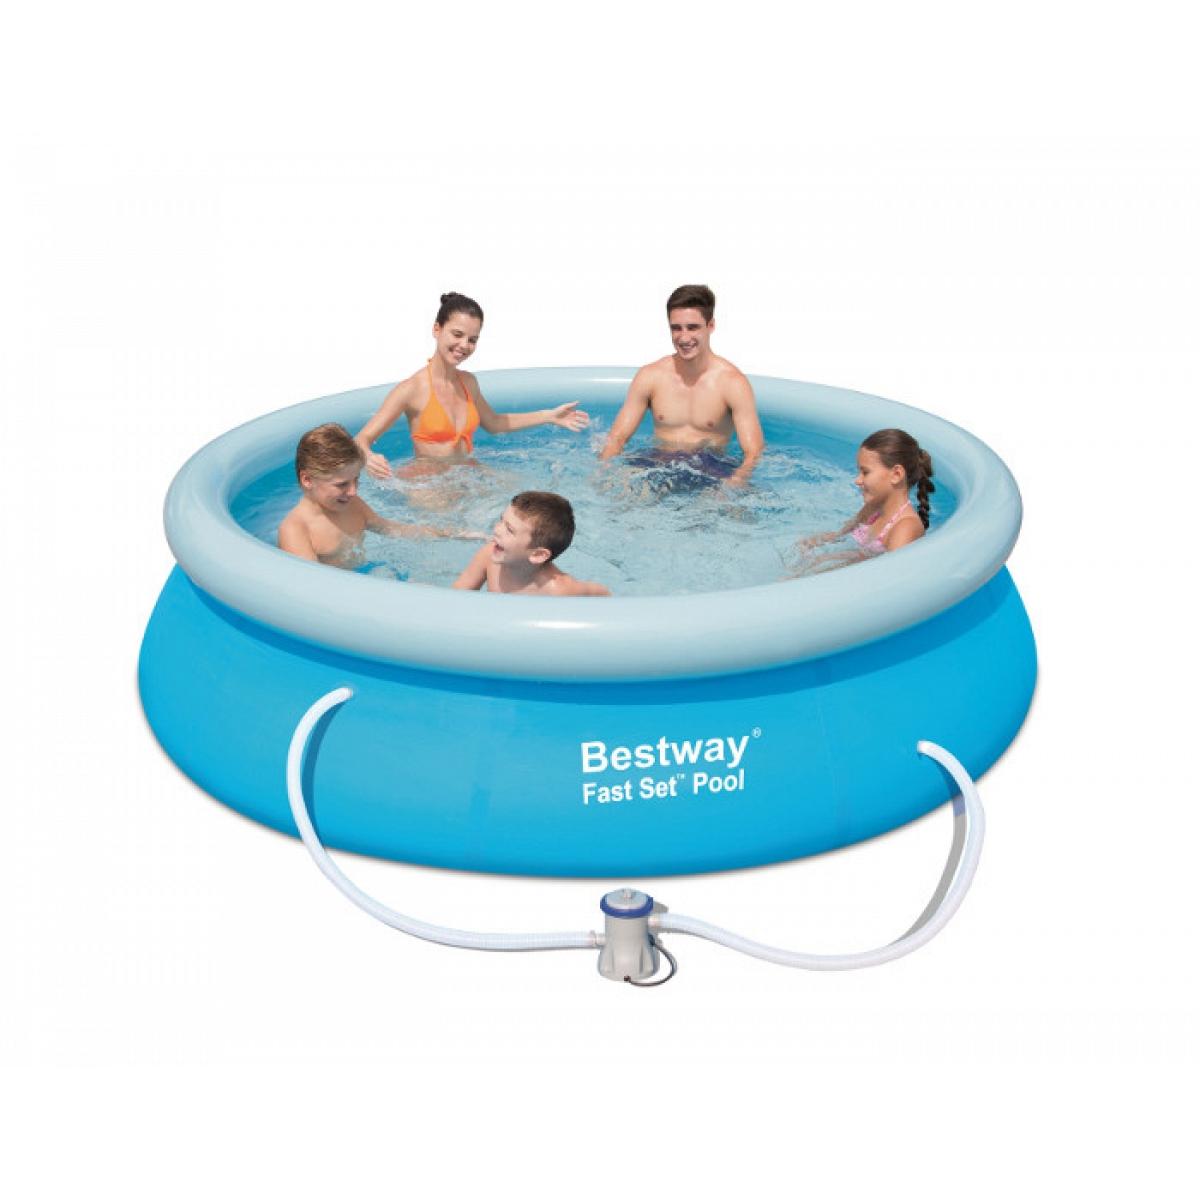 piscina fuoriterra tonda bestway 305x76 mod fast set. Black Bedroom Furniture Sets. Home Design Ideas